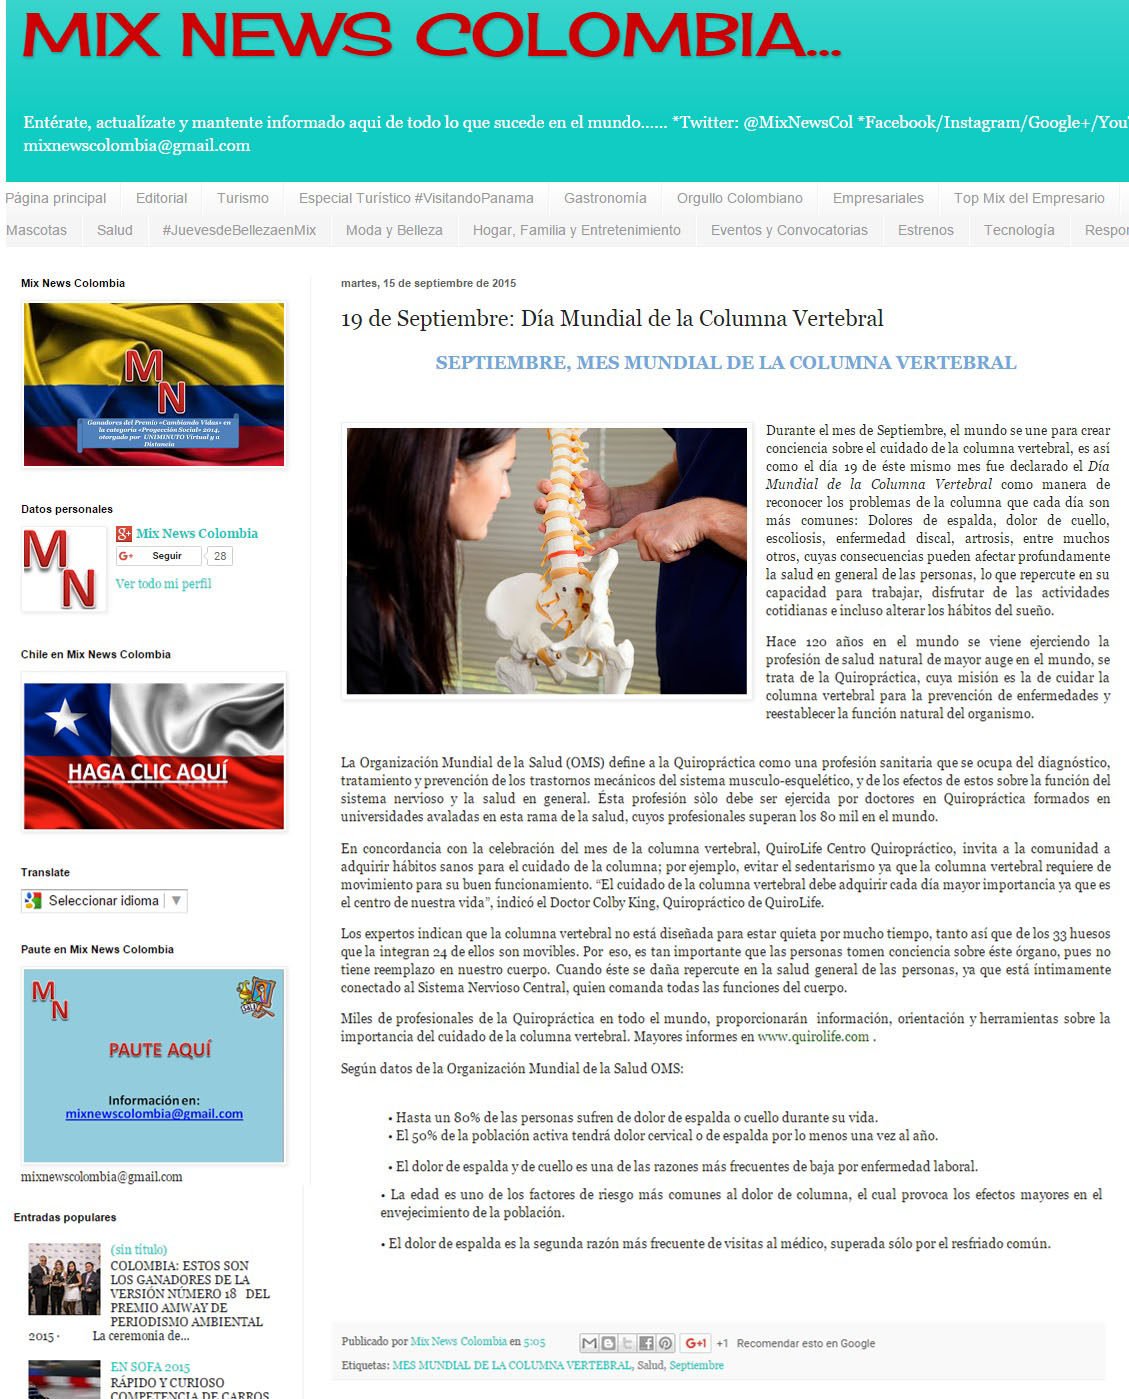 MixColombia 15 de septiembre [web]